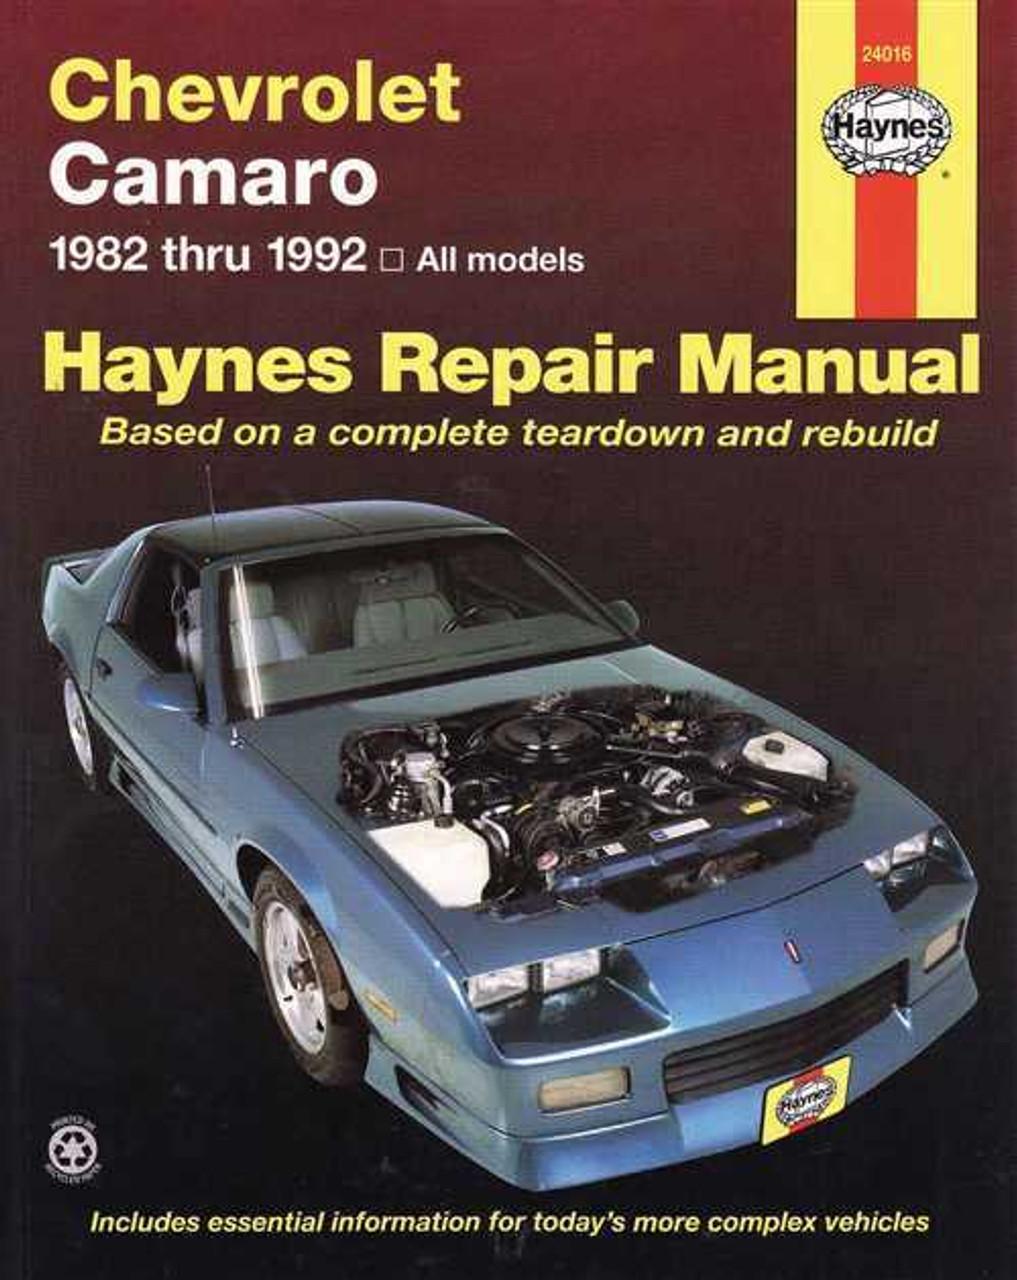 chevrolet camaro 1982 1992 workshop manual rh automotobookshop com au 88 Camaro Z28 1980 Camaro Z28